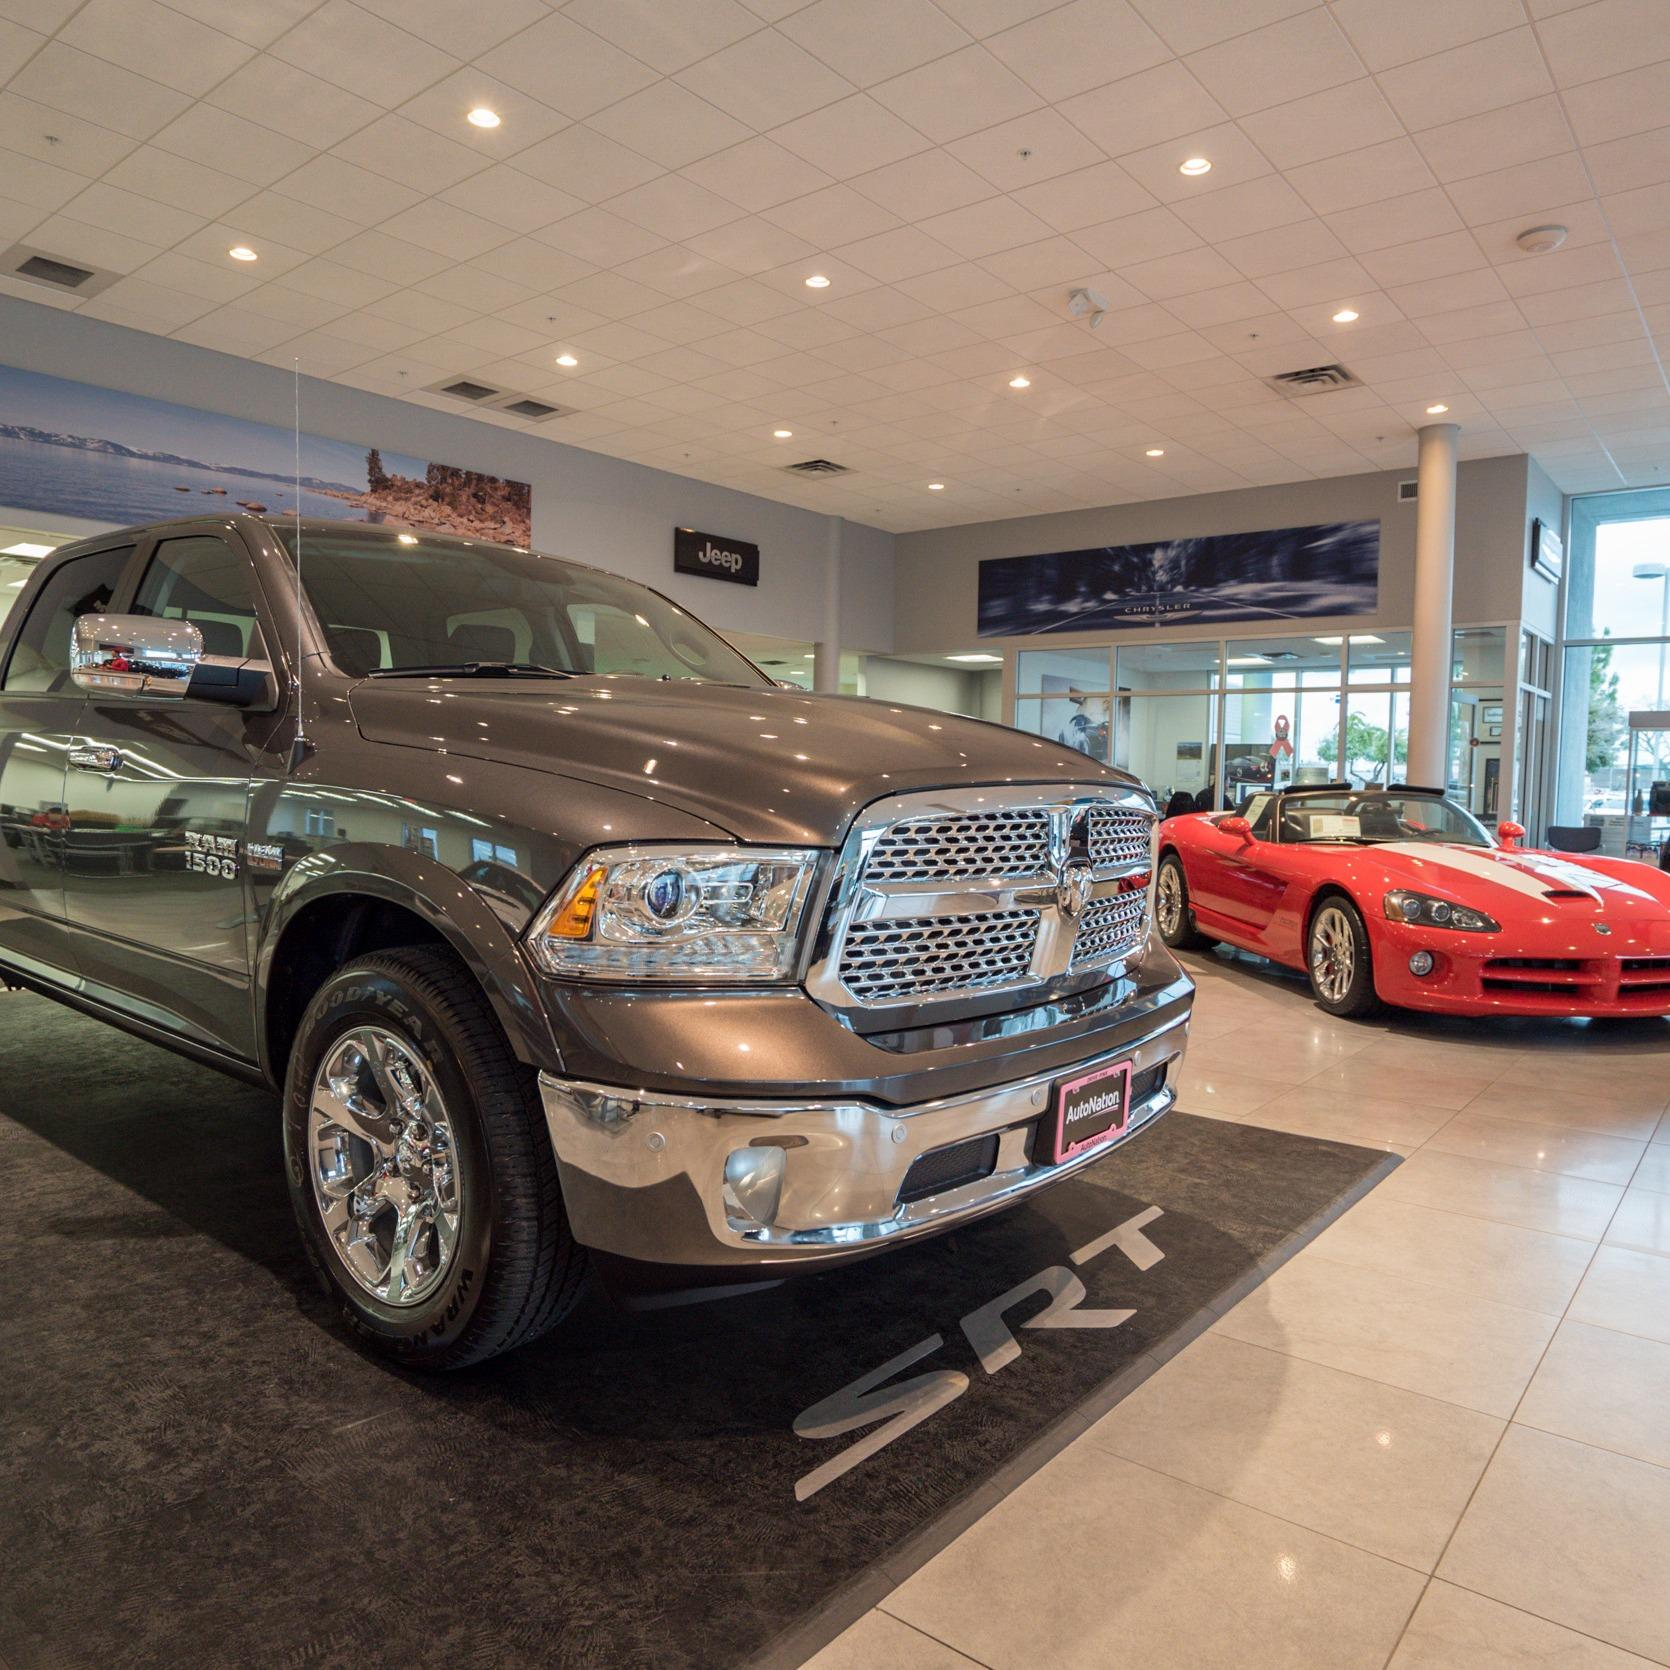 AutoNation Chrysler Dodge Jeep RAM Roseville